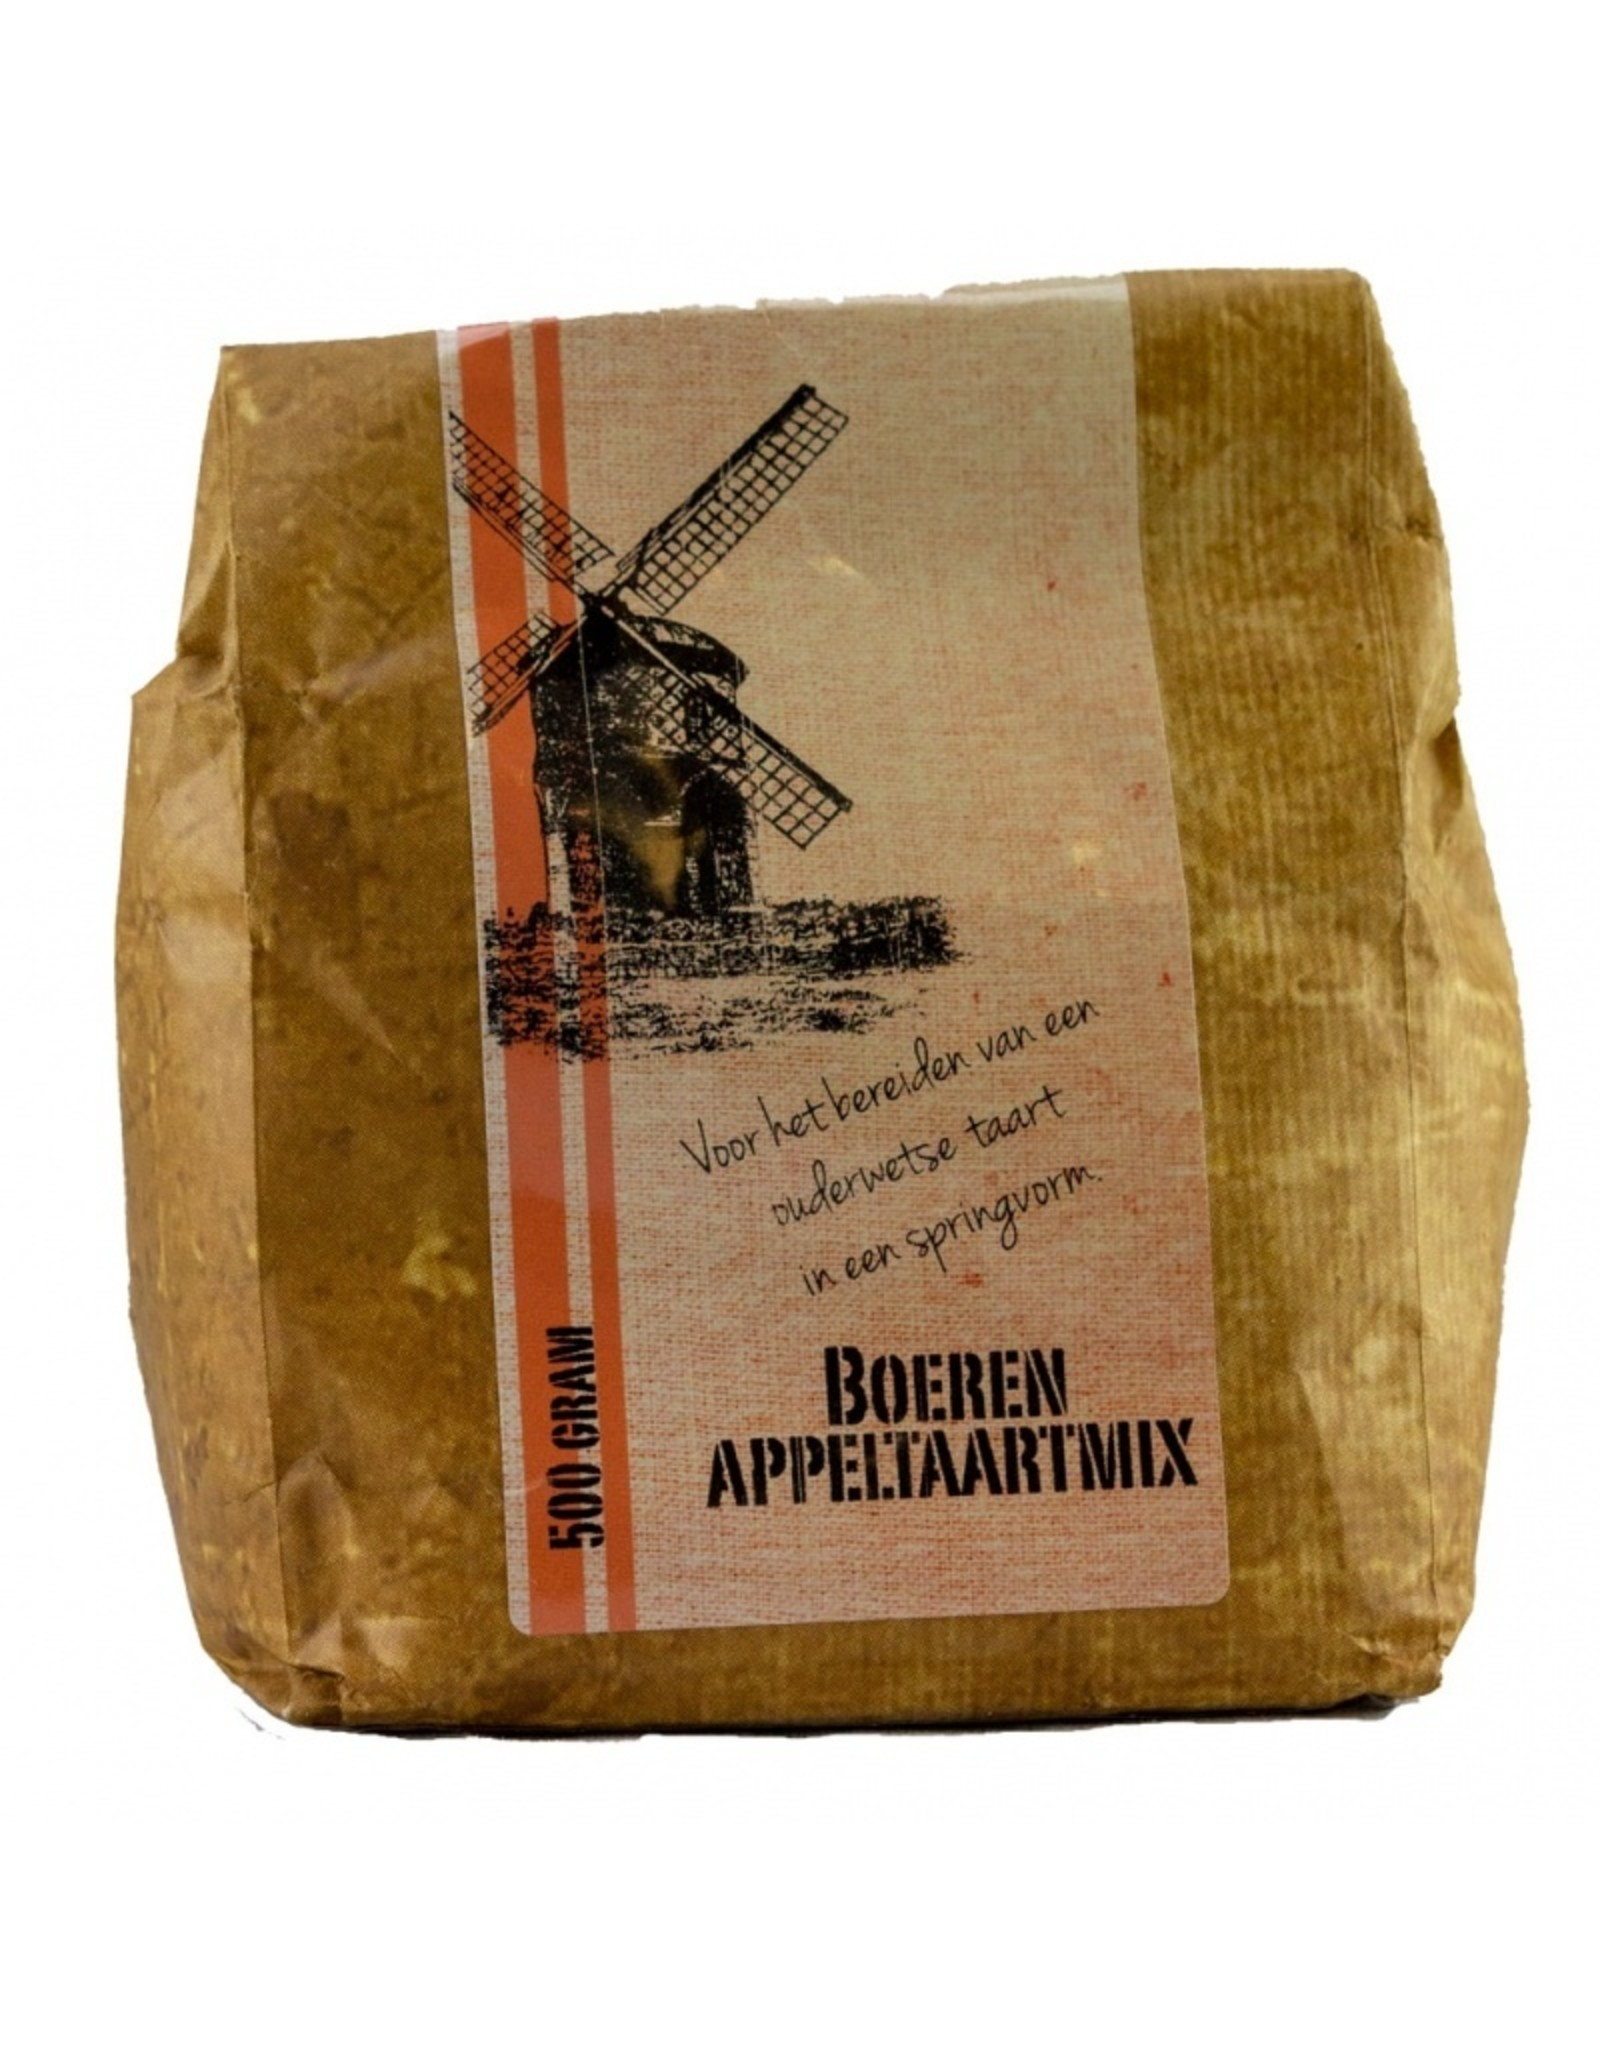 Landwinkel Boerenappeltaart mix 0,5 kg